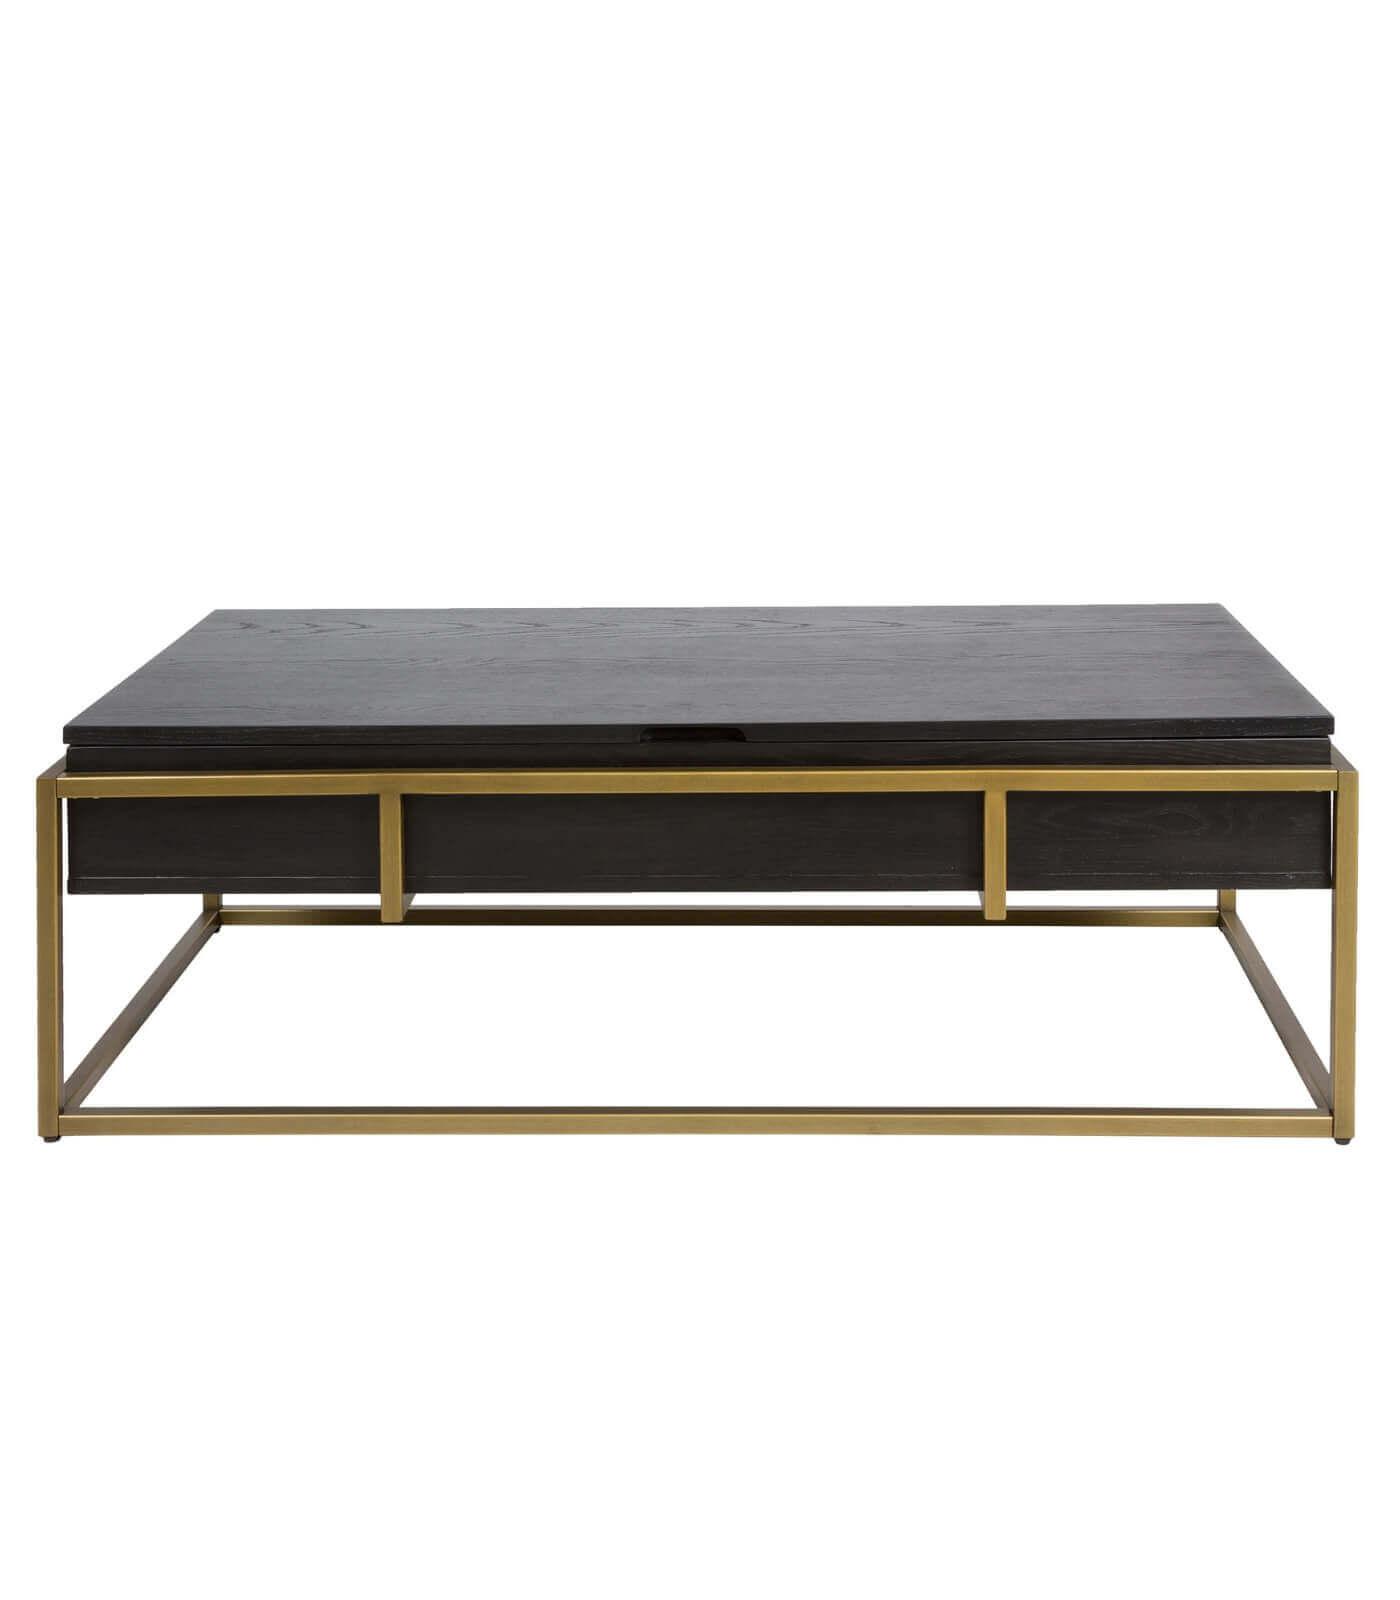 table basse blacky plateau relevable bois laiton pastel living. Black Bedroom Furniture Sets. Home Design Ideas